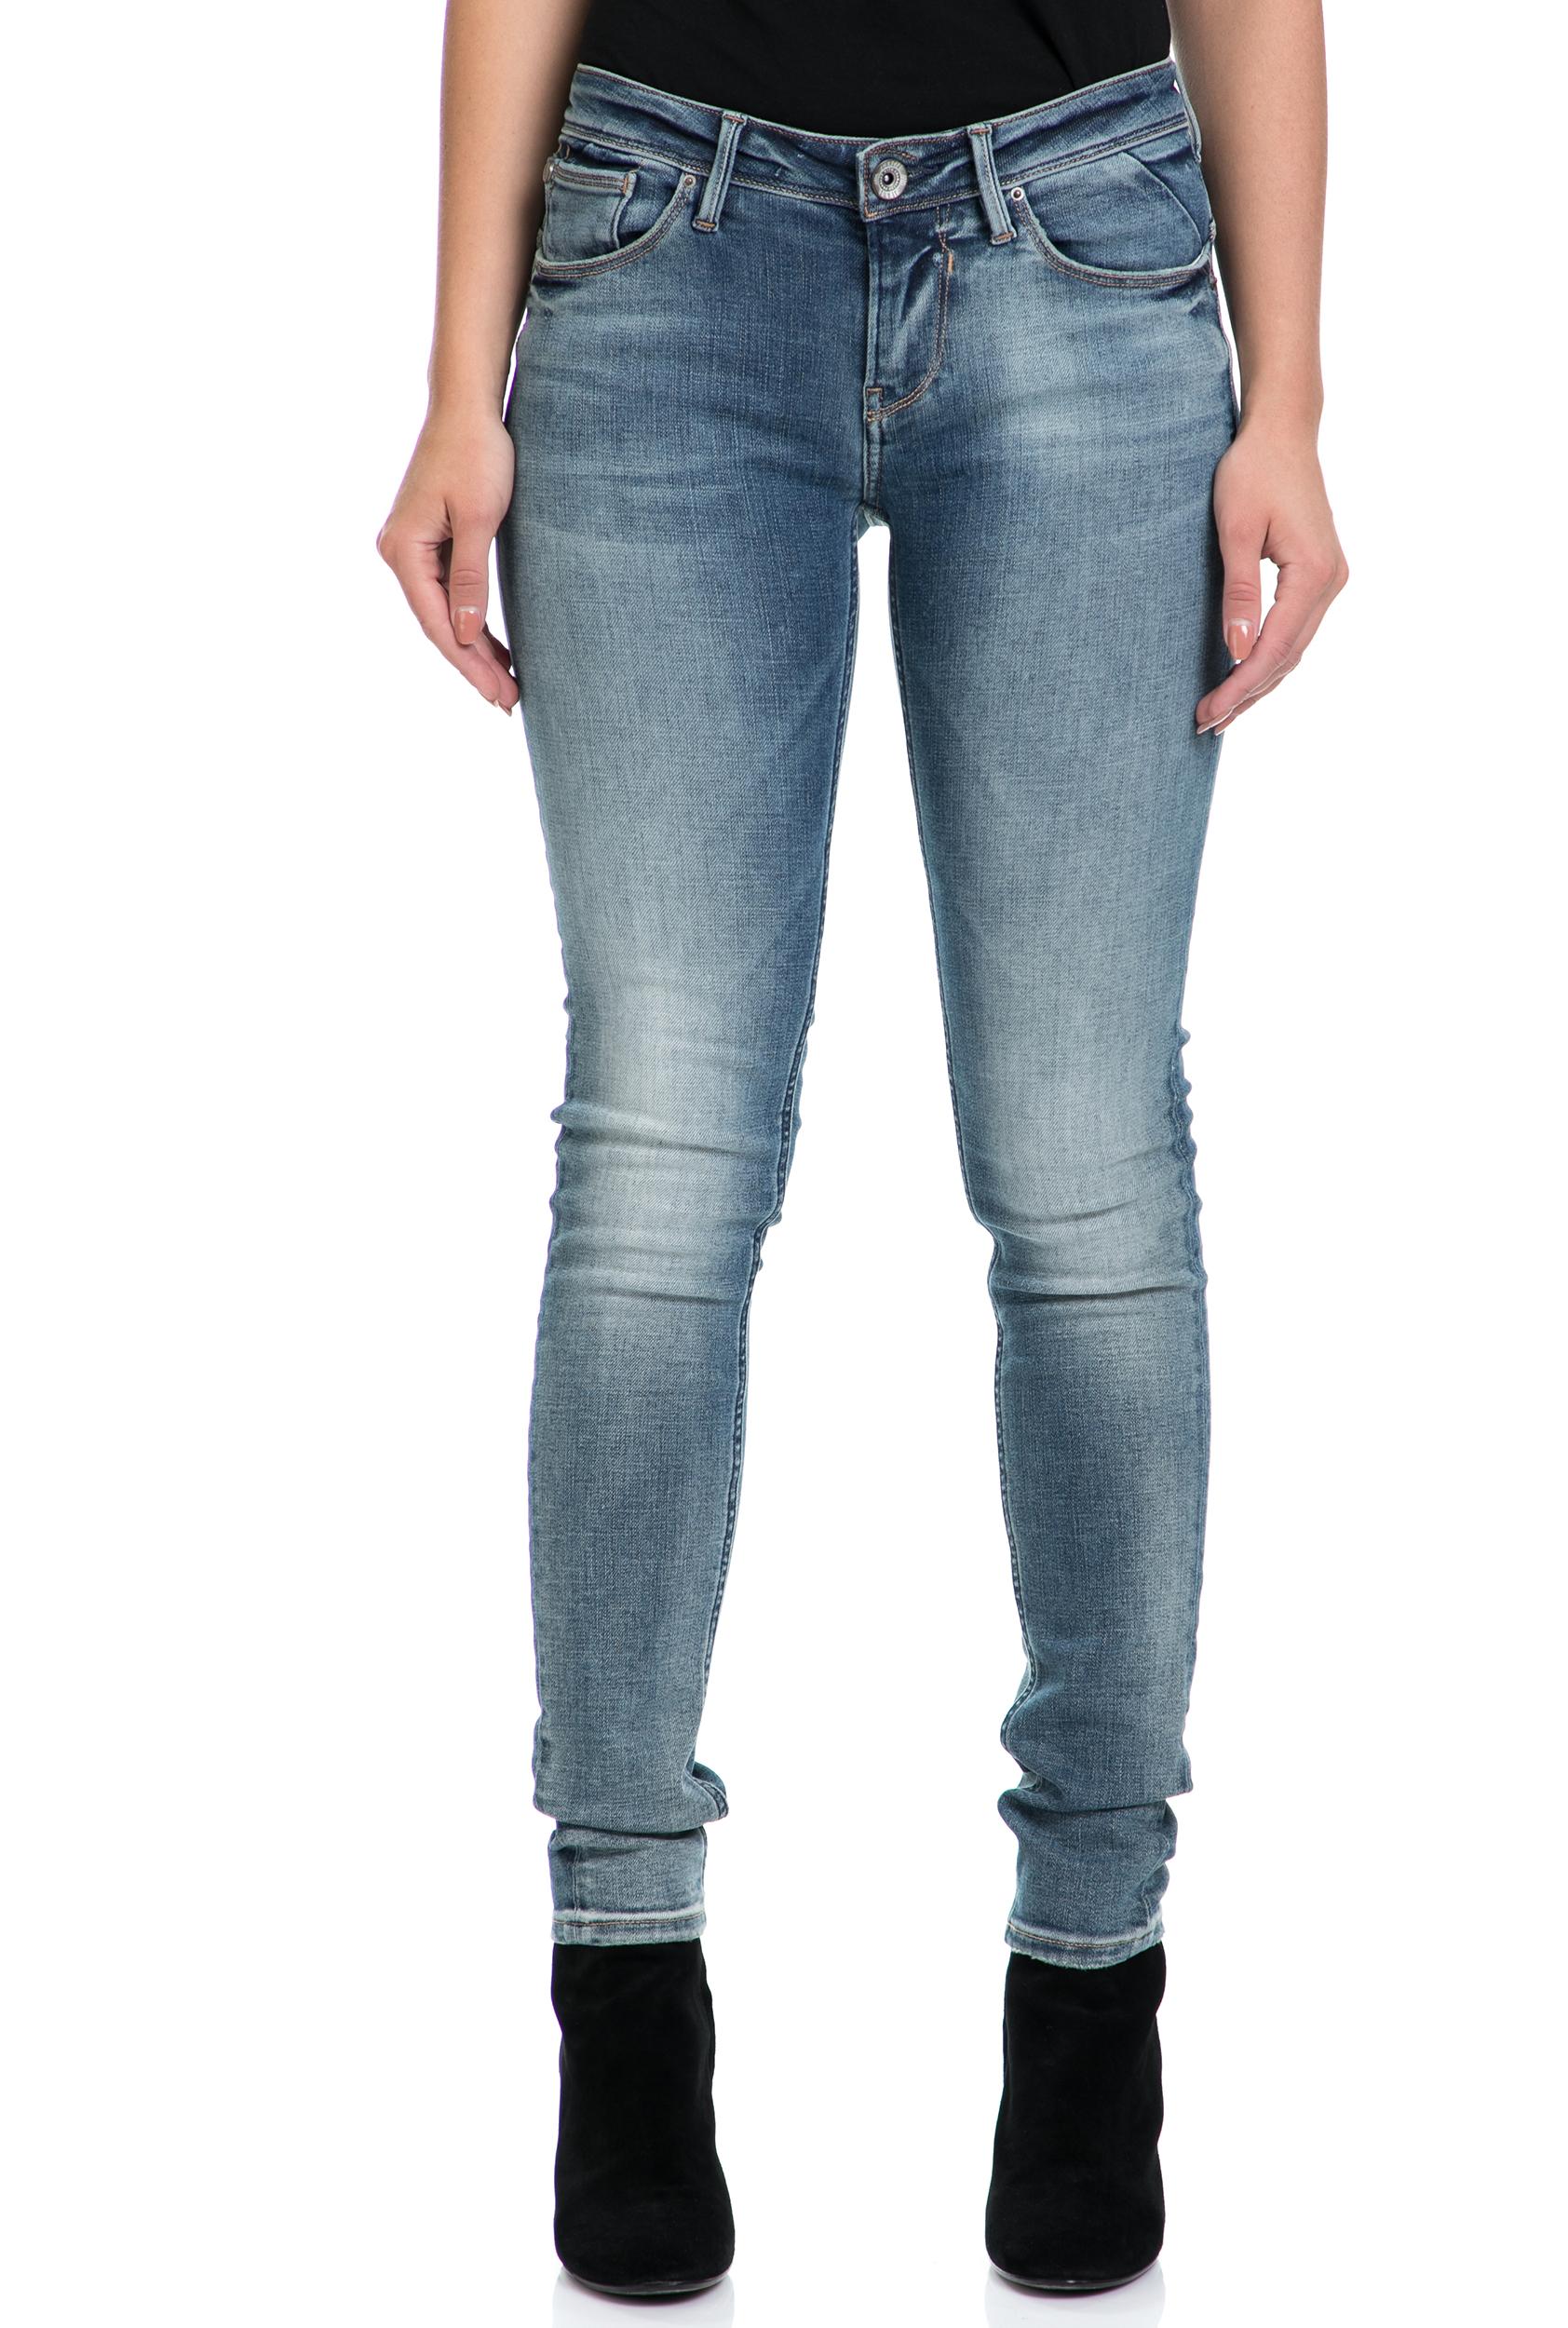 d06523916cf4 GARCIA JEANS - Γυναικείο τζιν παντελόνι Riva GARCIA JEANS μπλε